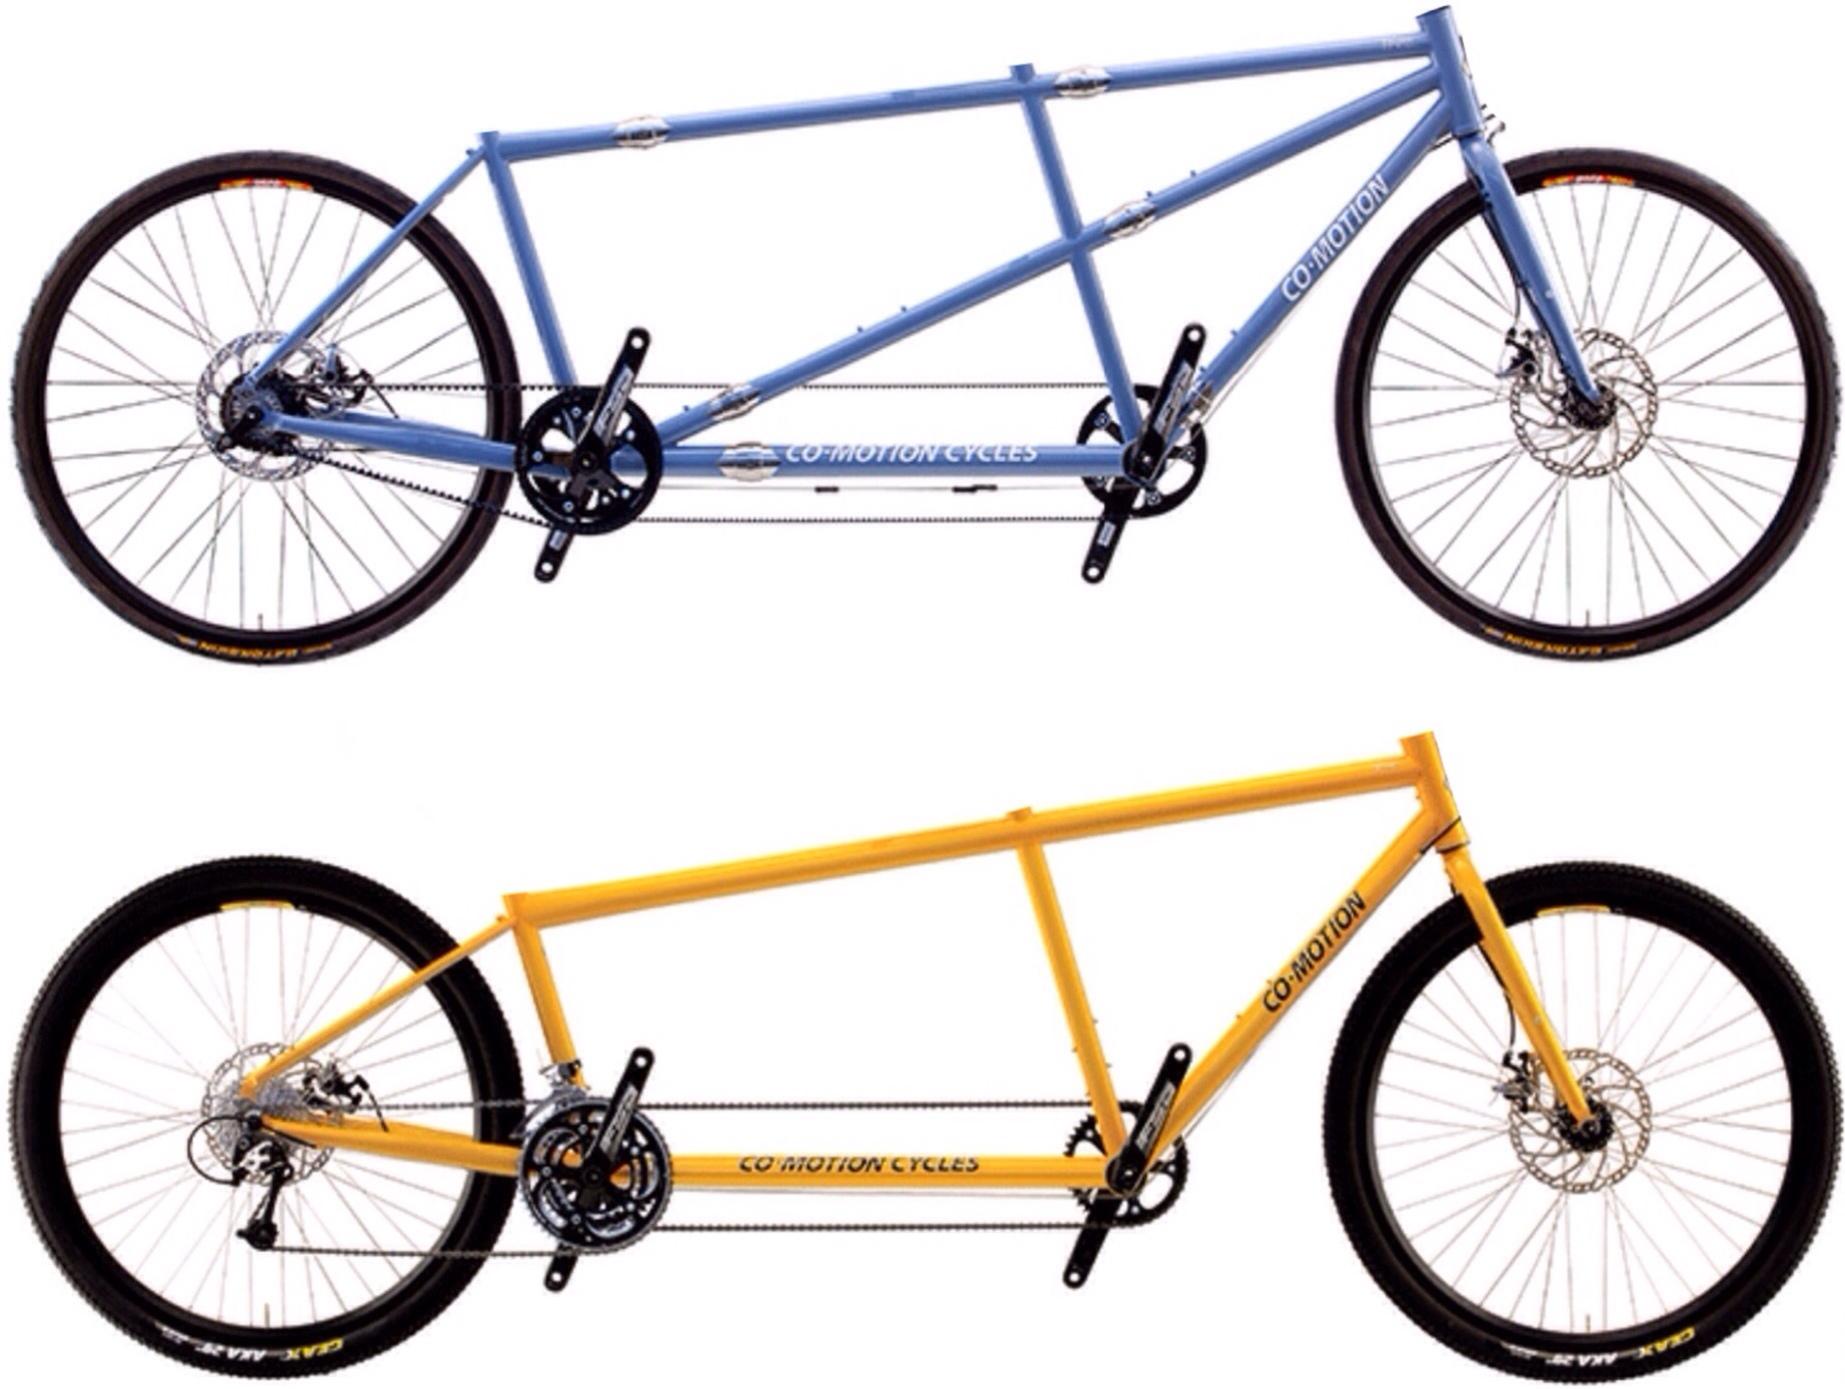 Marathon vs Compact Tandem Bikes